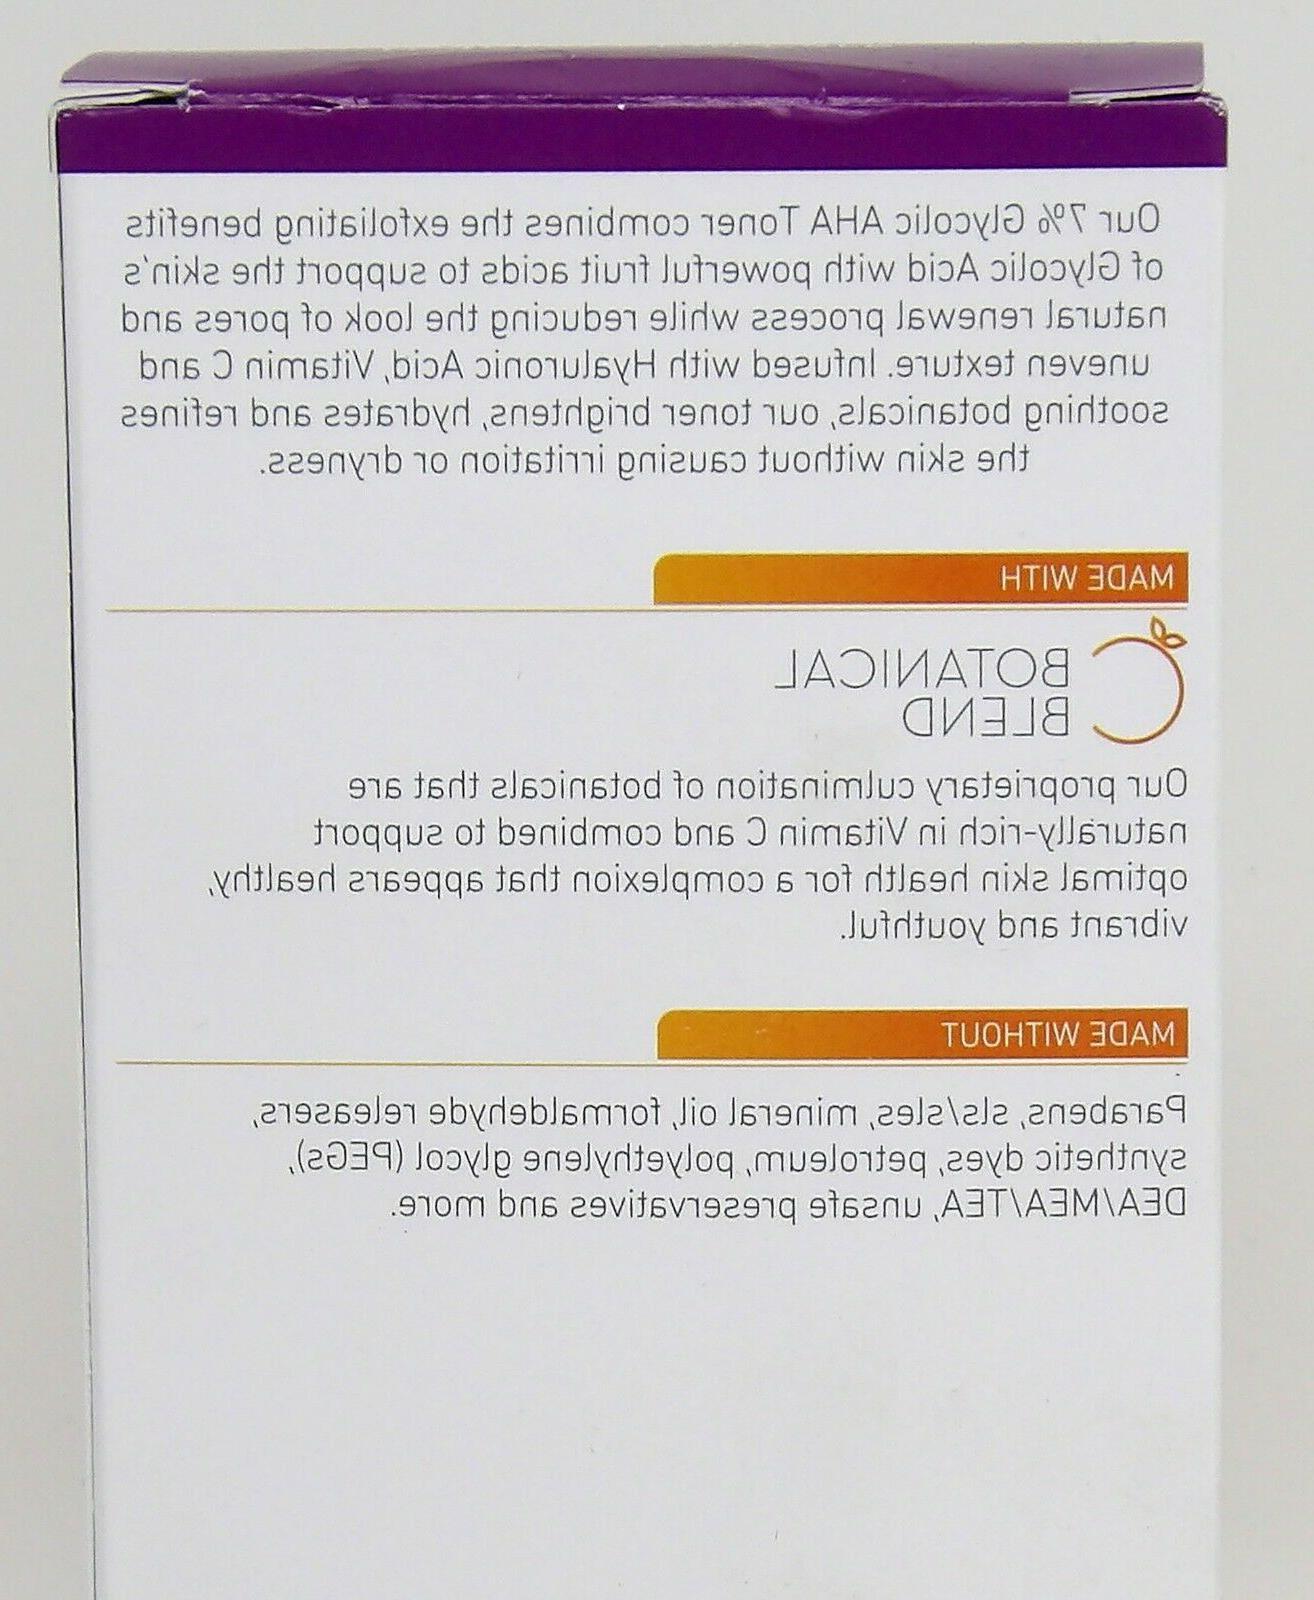 Instanatural Glycolic Toner 7% Vitamin C